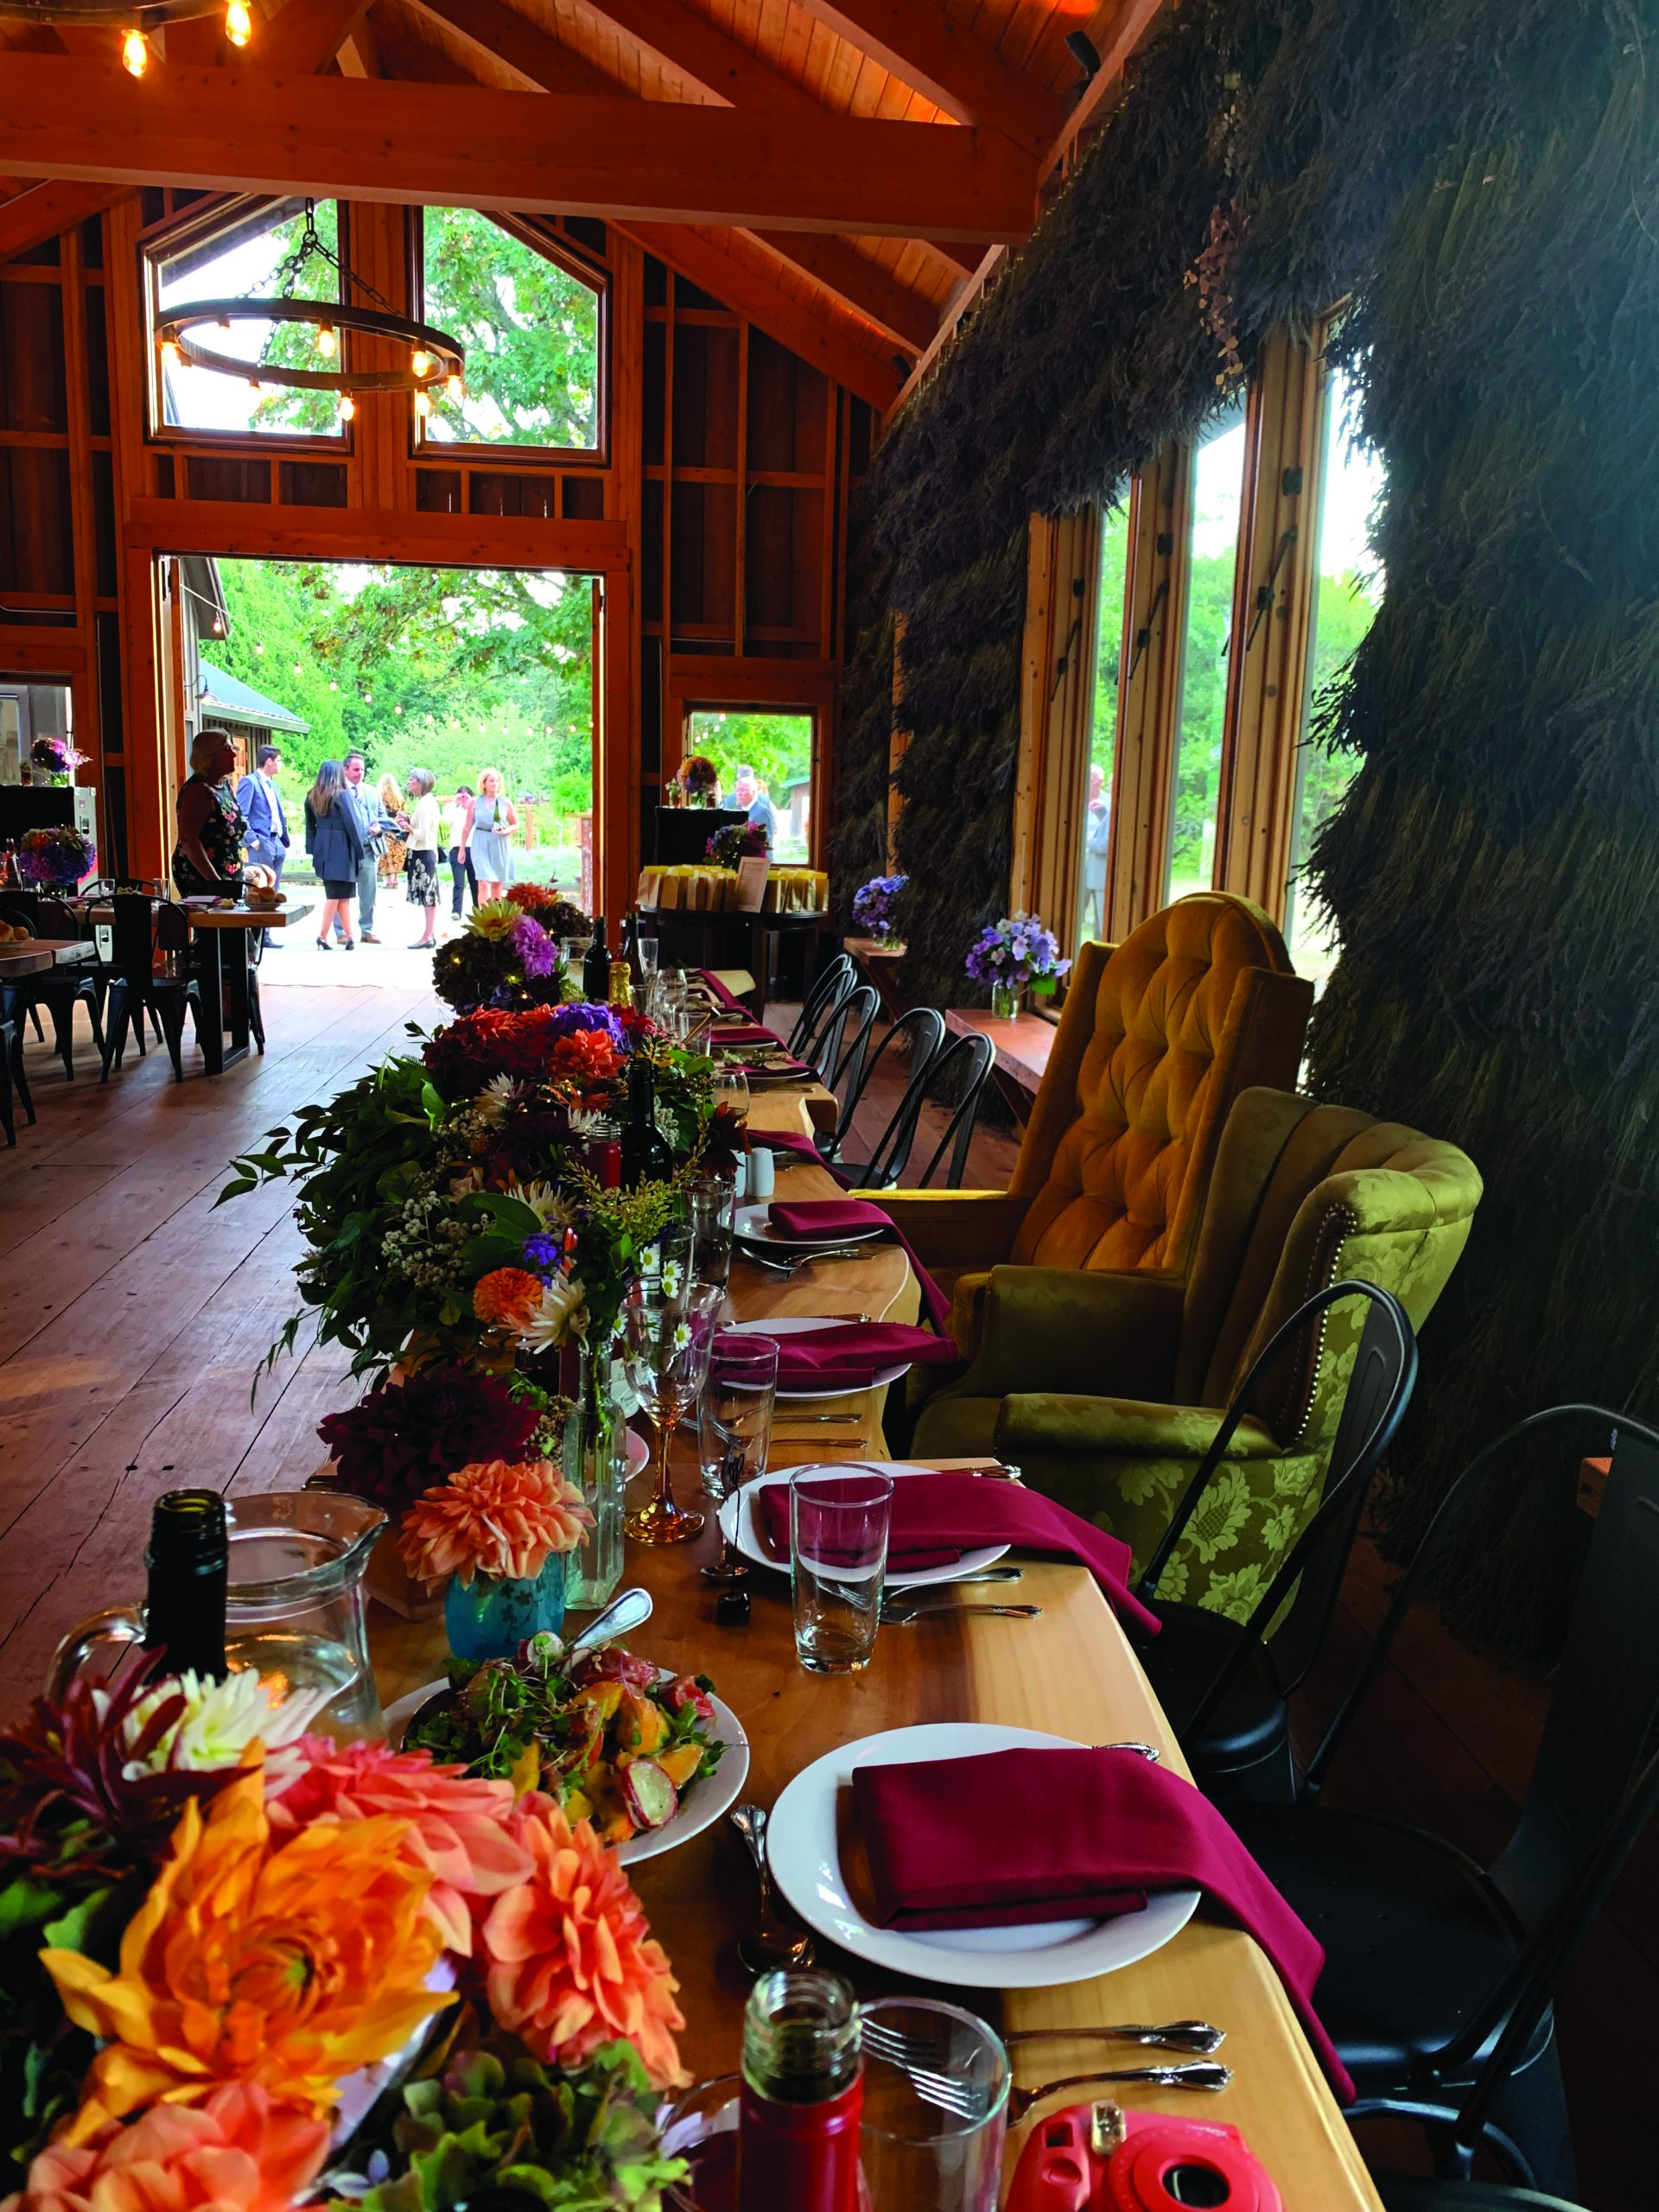 Charming Farm Wedding Reception Table with Vintage Chairs at Bilston Creek Farm